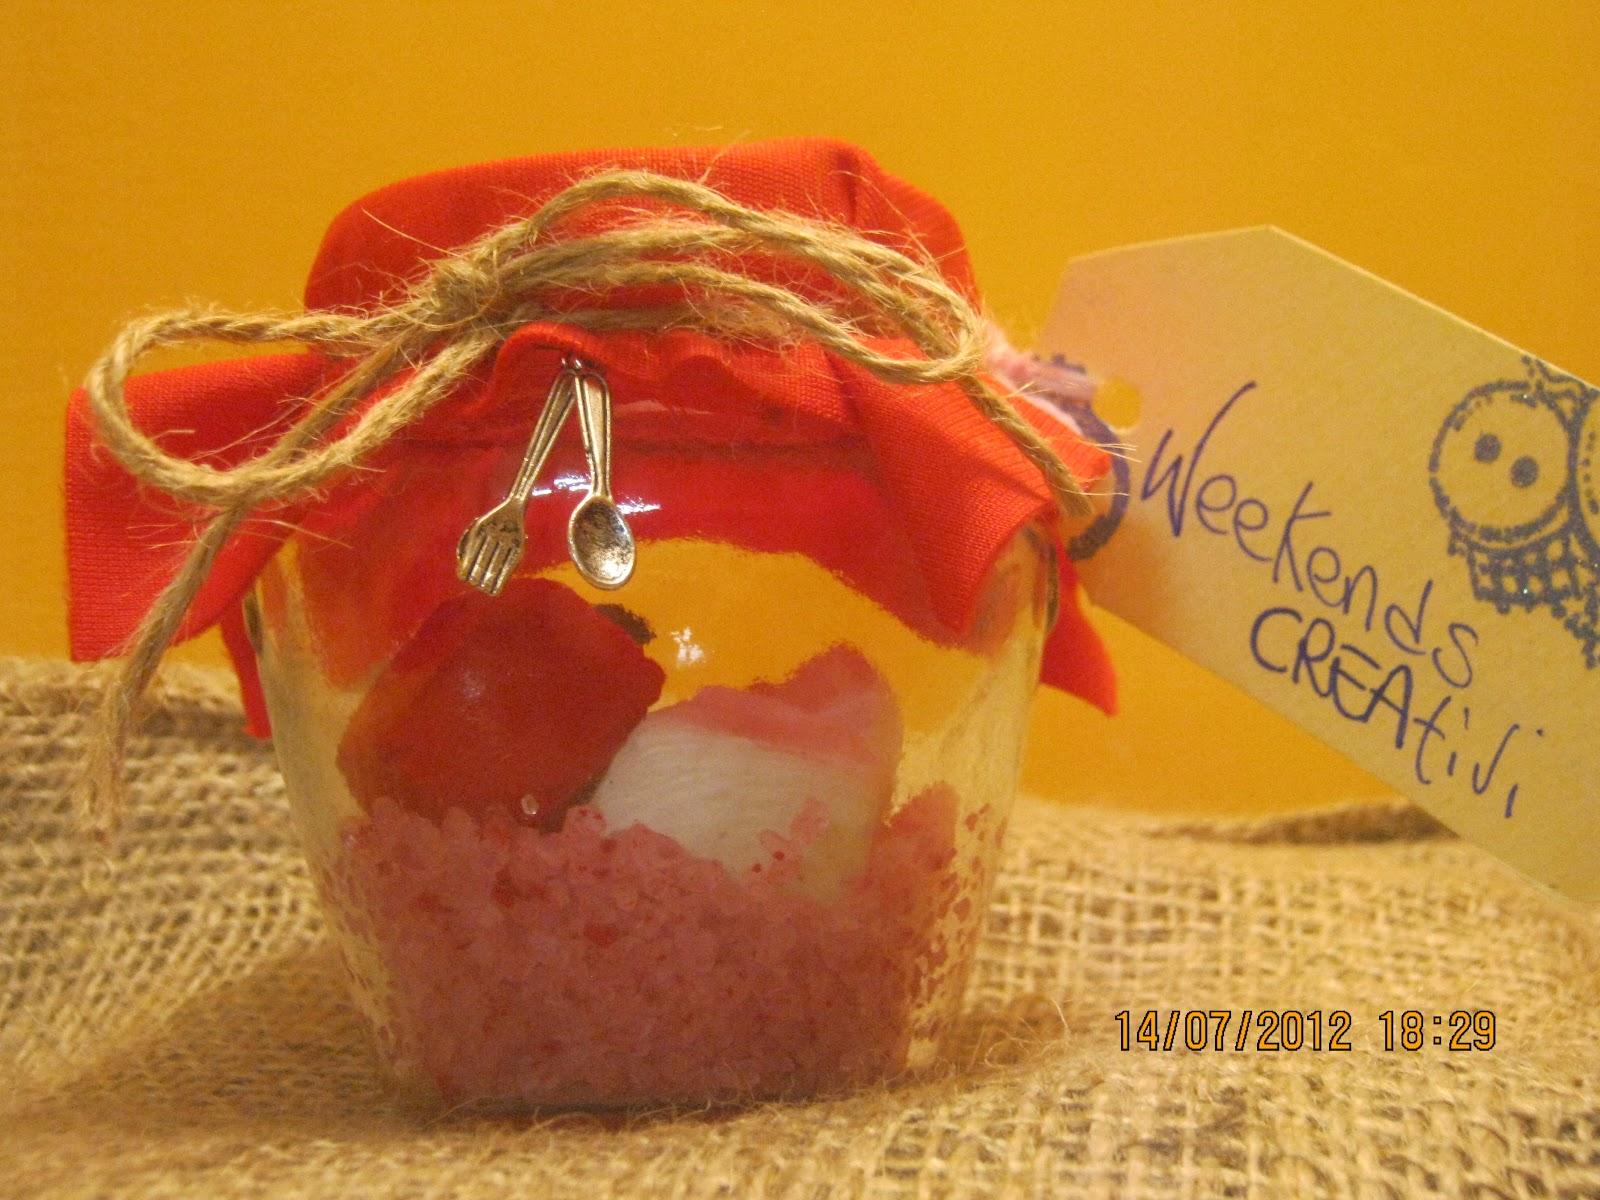 Ricetta Sali Da Bagno Profumati : Week ends creativi vasetti con gessi e sali profumati